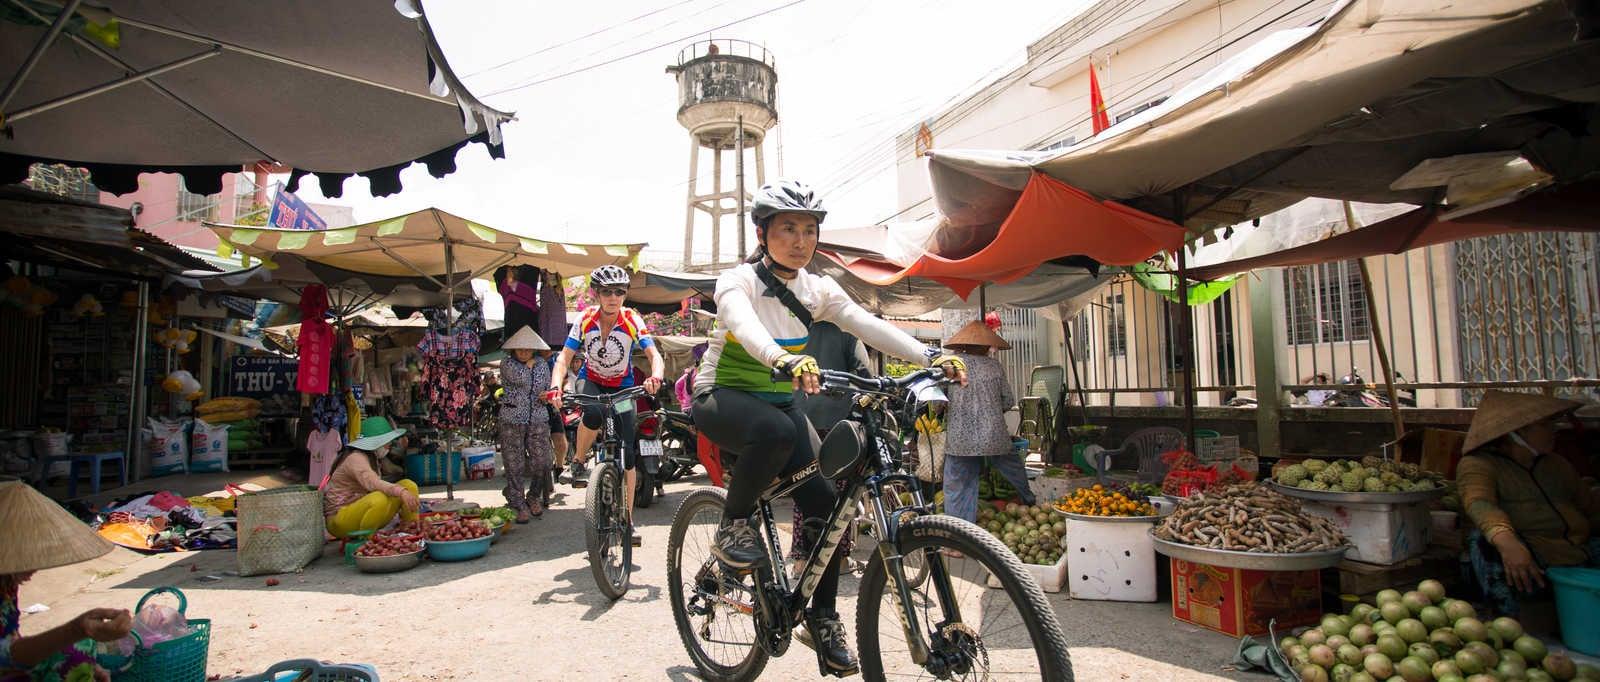 Cycling through the markets, Vietnam